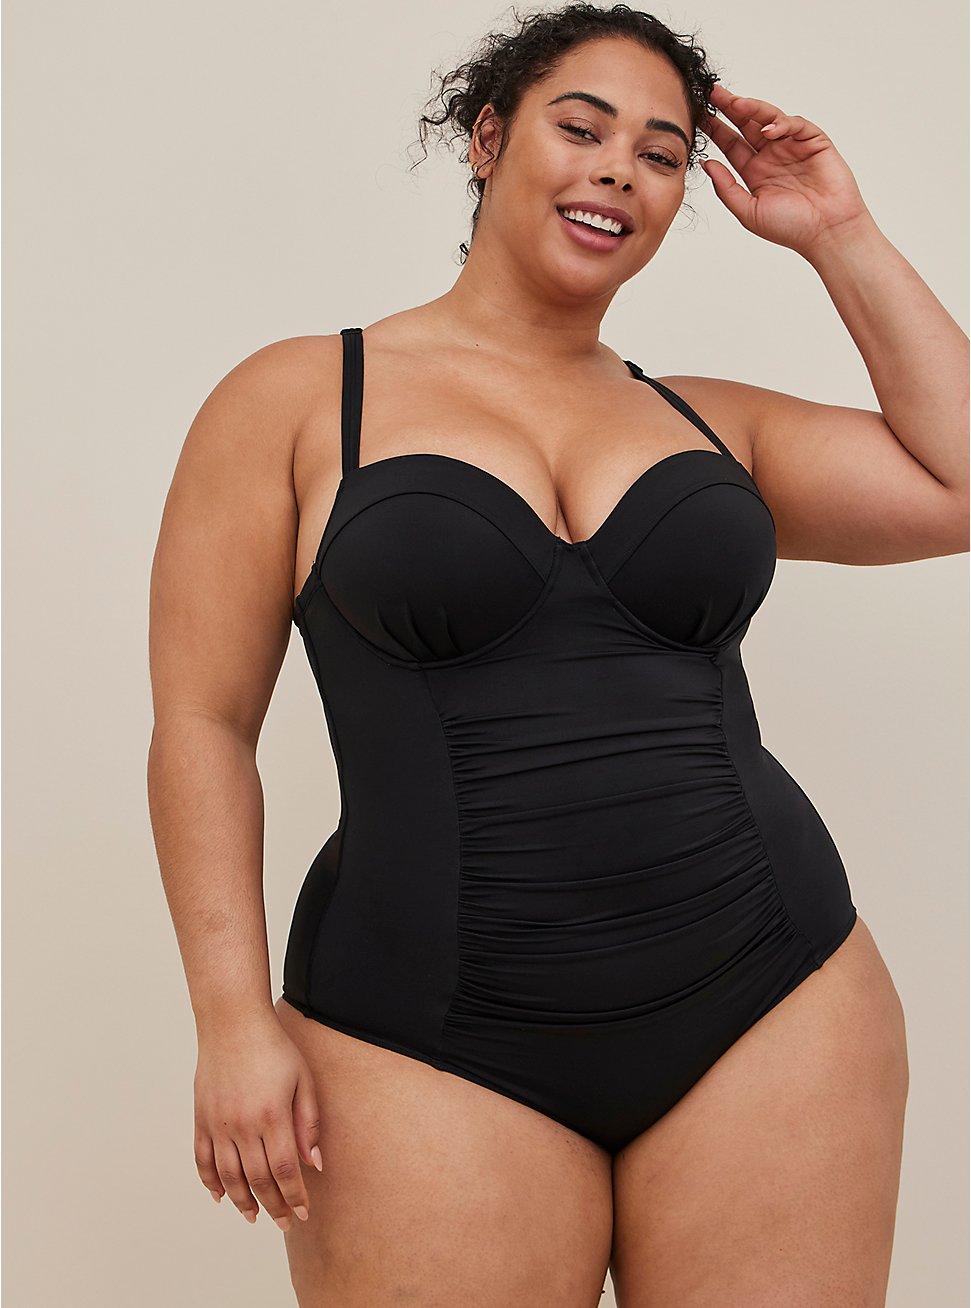 Black Lattice Back Push-Up Underwire One-Piece Swimsuit , , fitModel1-hires